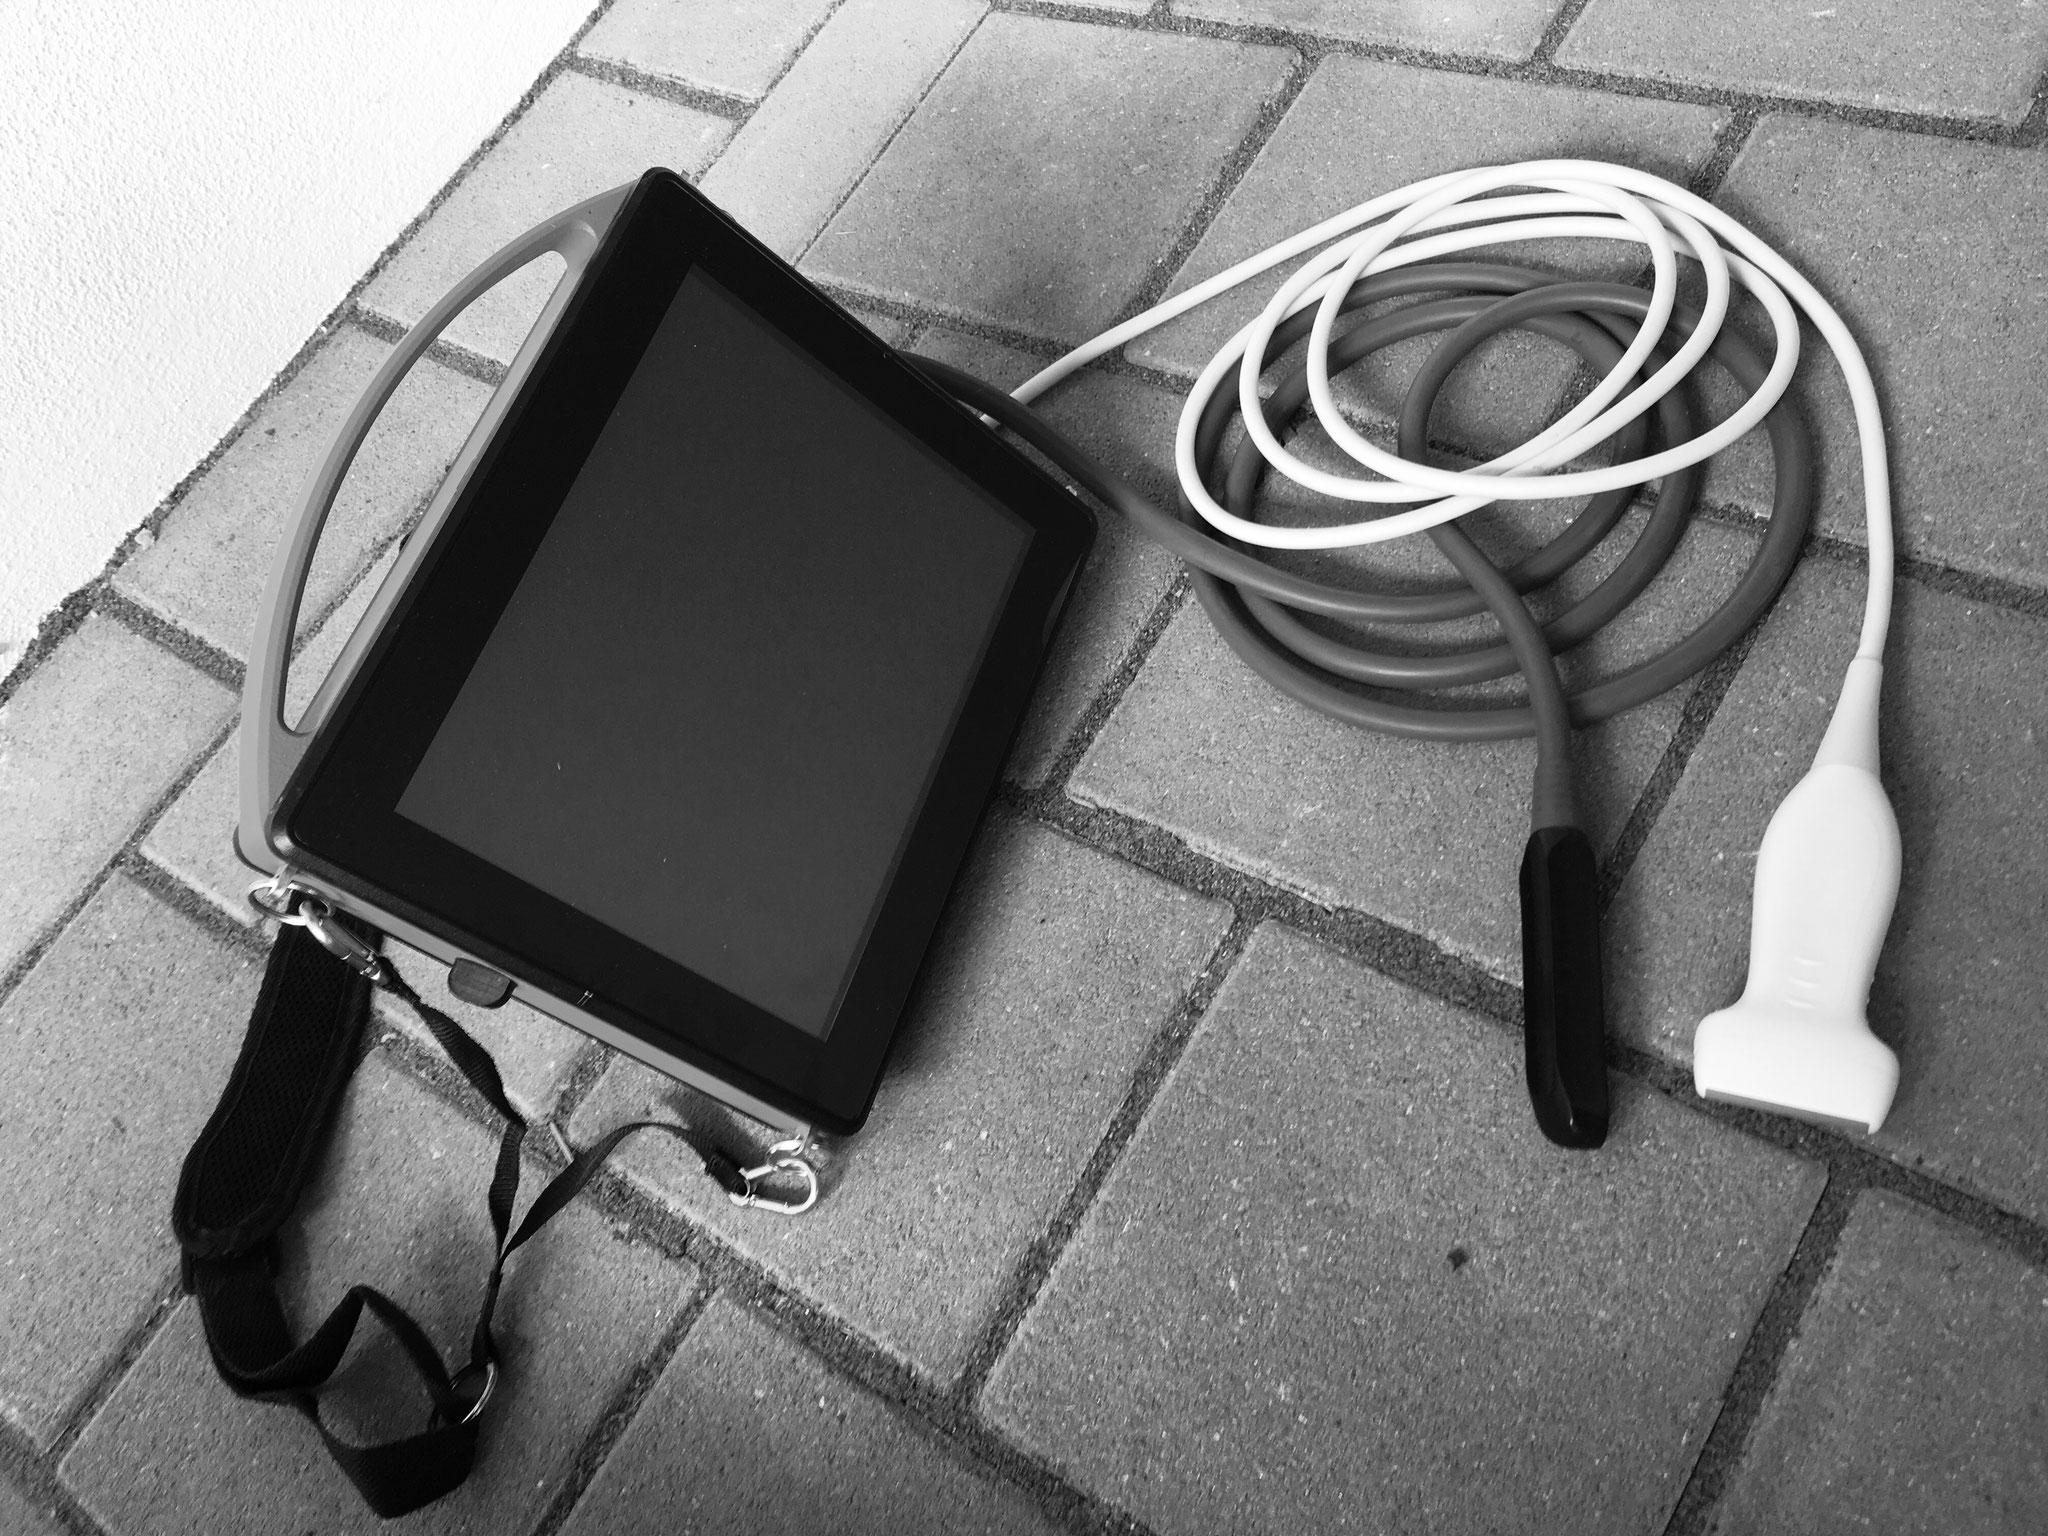 Mobiles Ultraschallgerät für Orthopädie und Gynäkologie